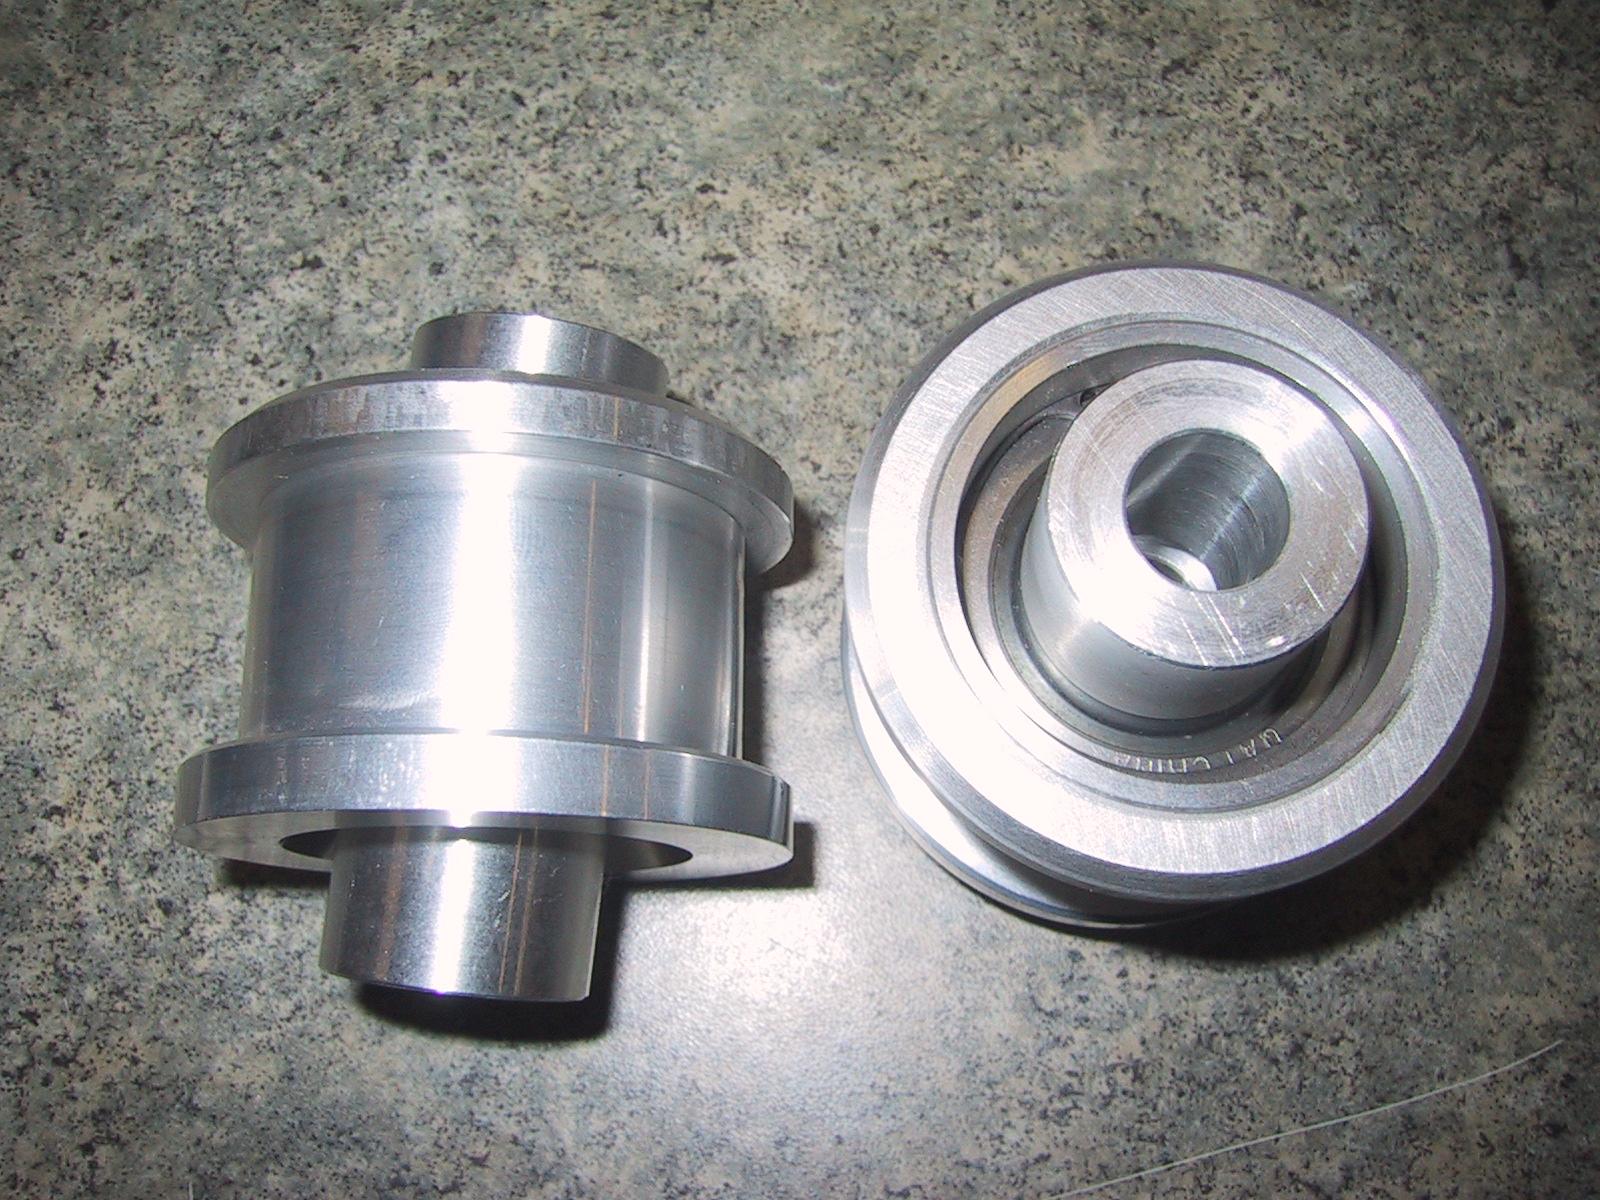 Aluminum Spherical Upper Control Arm Bushings (1 Pair)